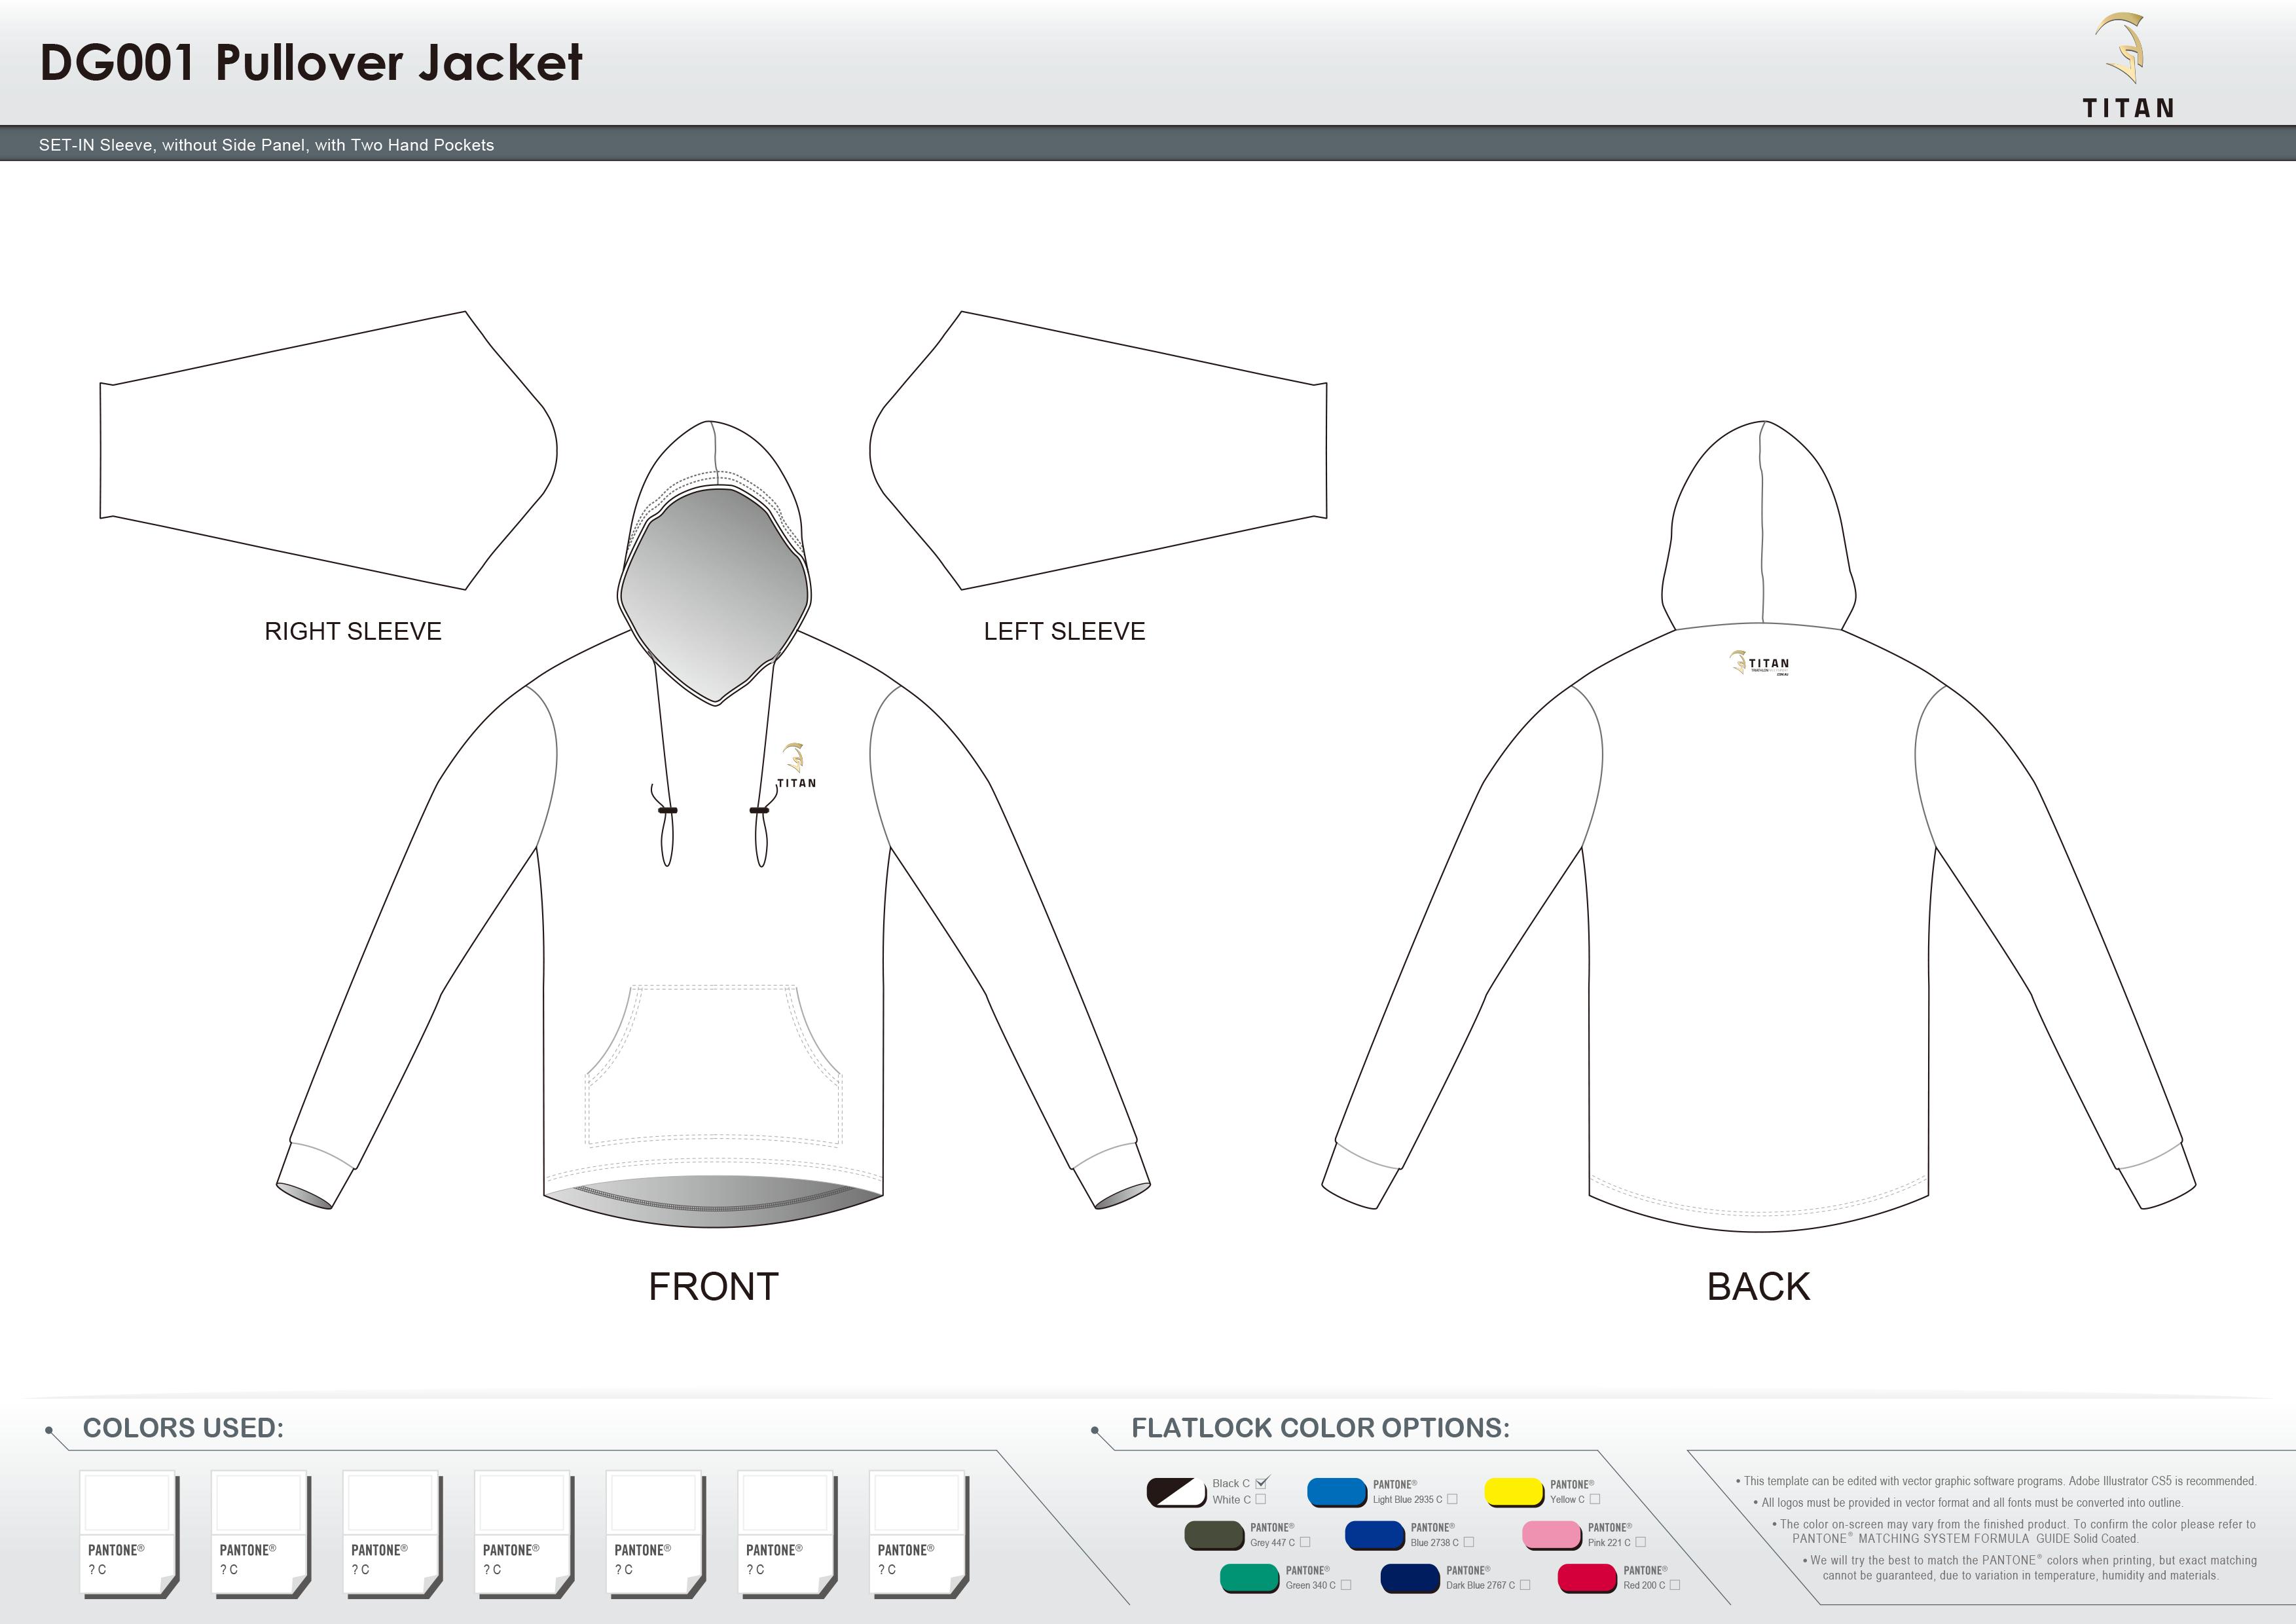 DG001 Pullover Jacket